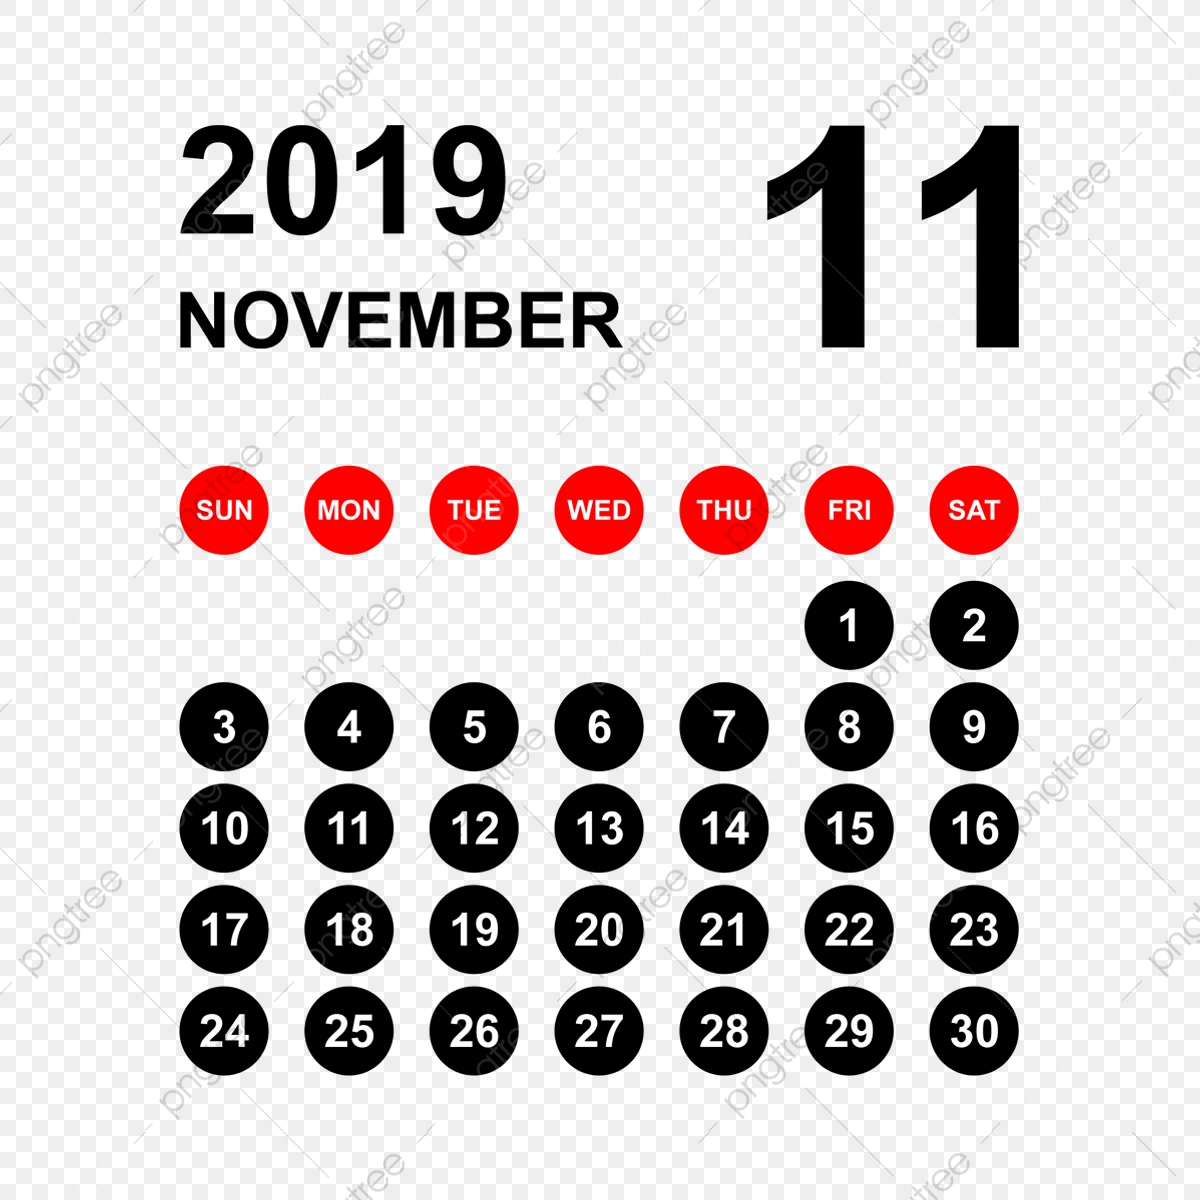 2019 Calendar November Calendar Calendar 2019 Calendar 2019 throughout November Calendar Clipart Free